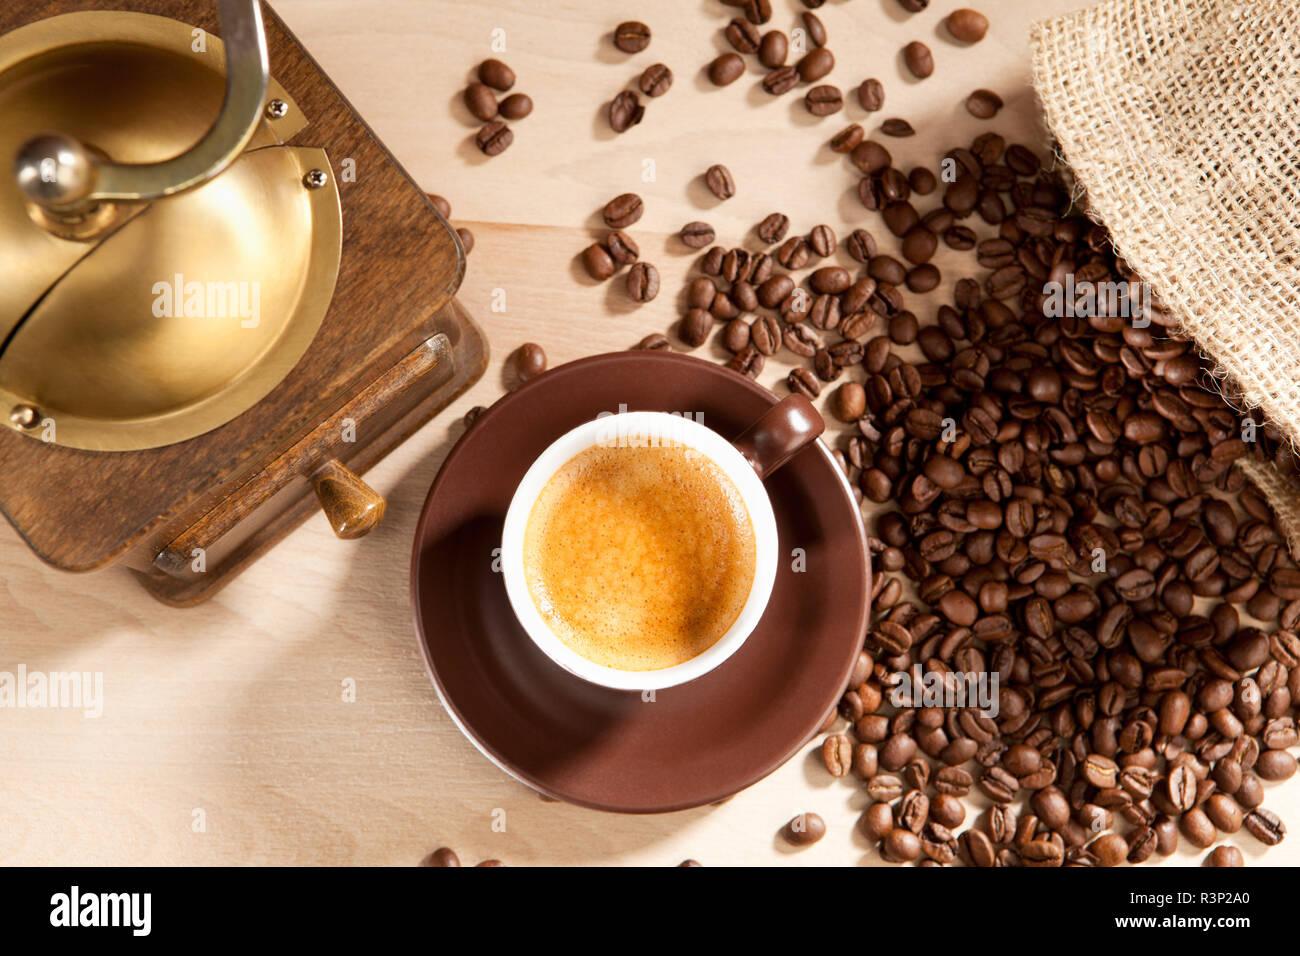 pleasure of freshly ground coffee beans - Stock Image